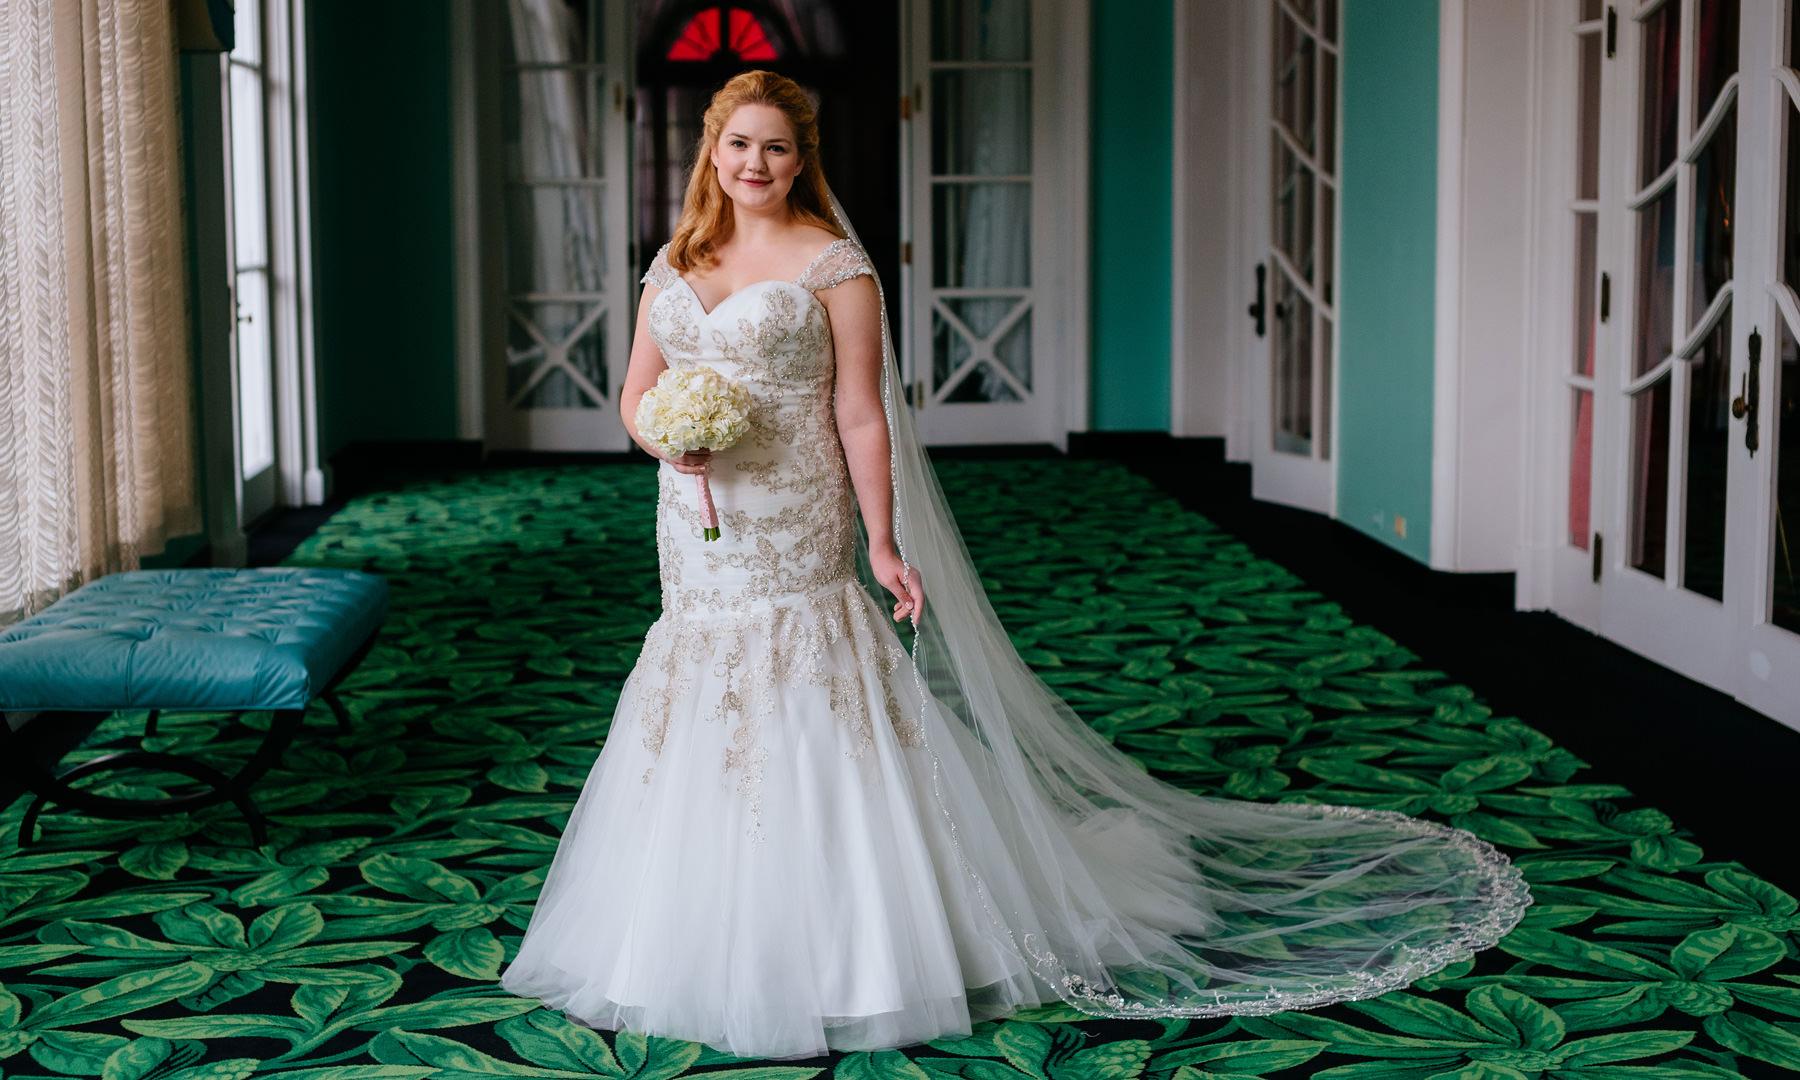 dorothy draper greenbrier bride